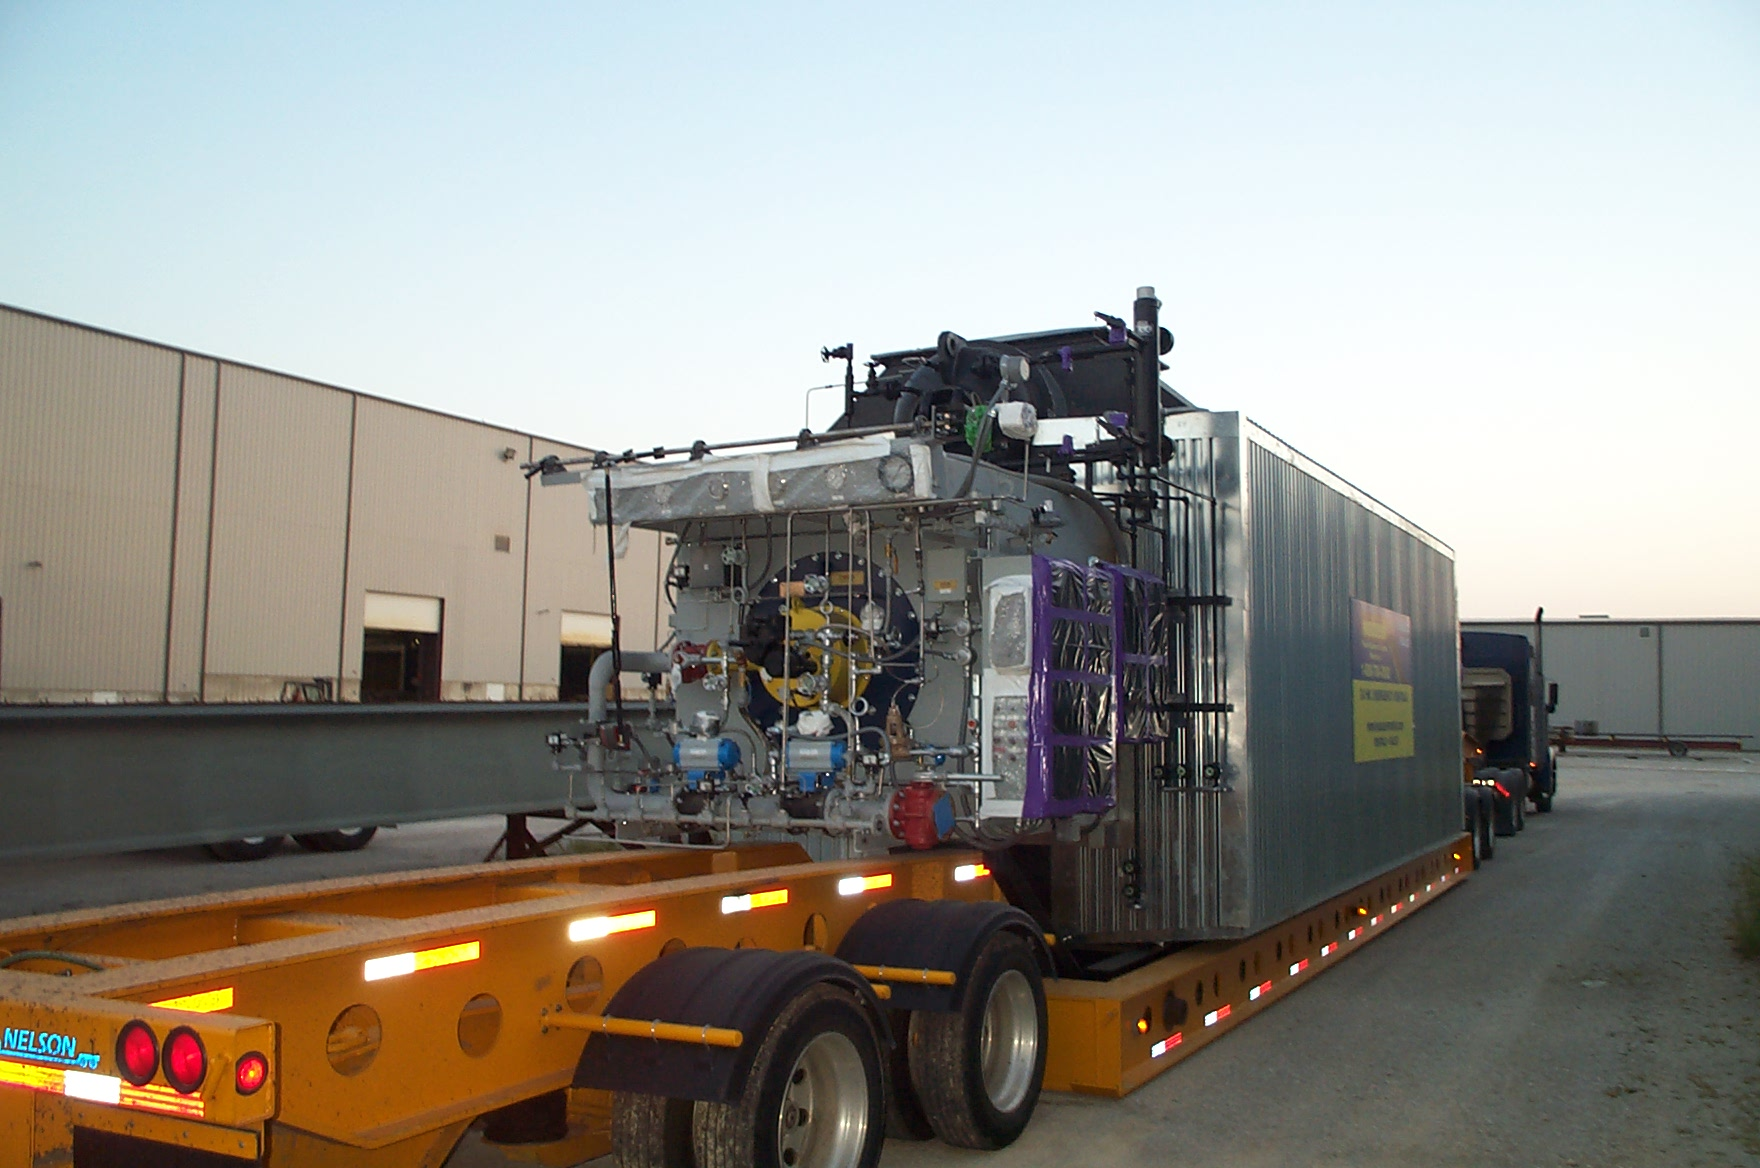 75,000#/Hour 750 PSI Optimus Packaged Water Tube Boiler